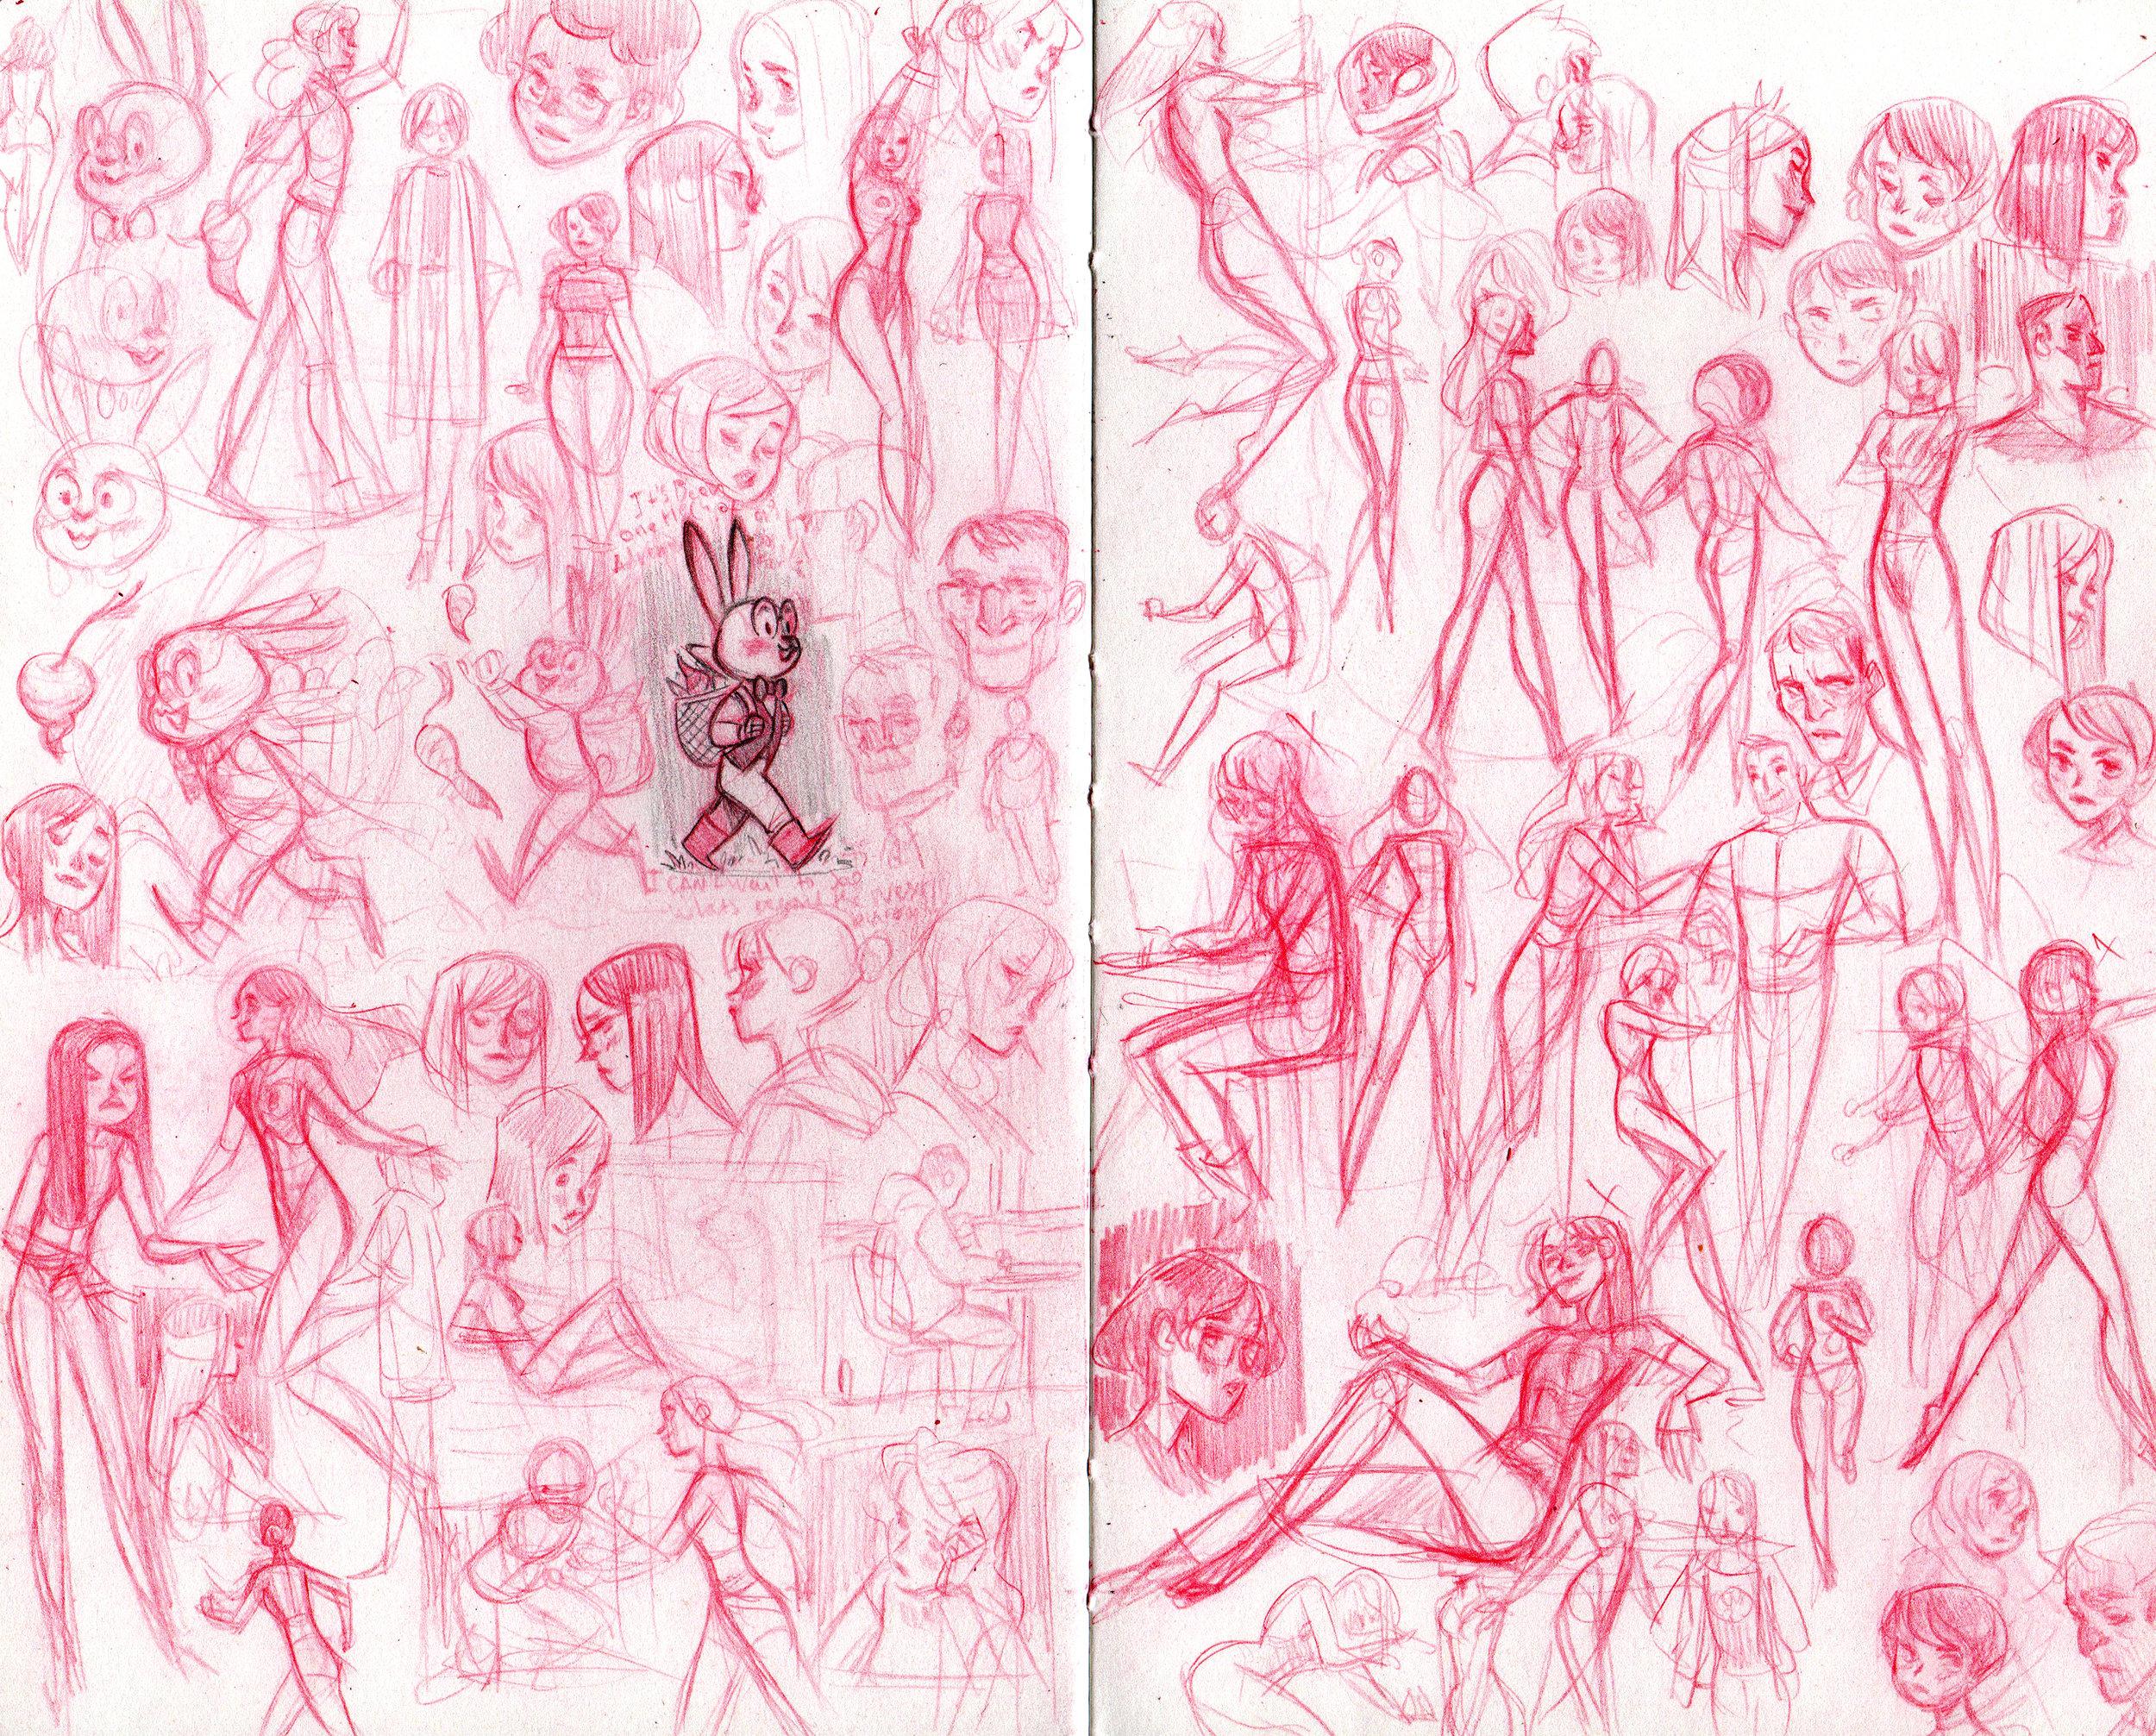 winter2018_2019 sketches11.jpg